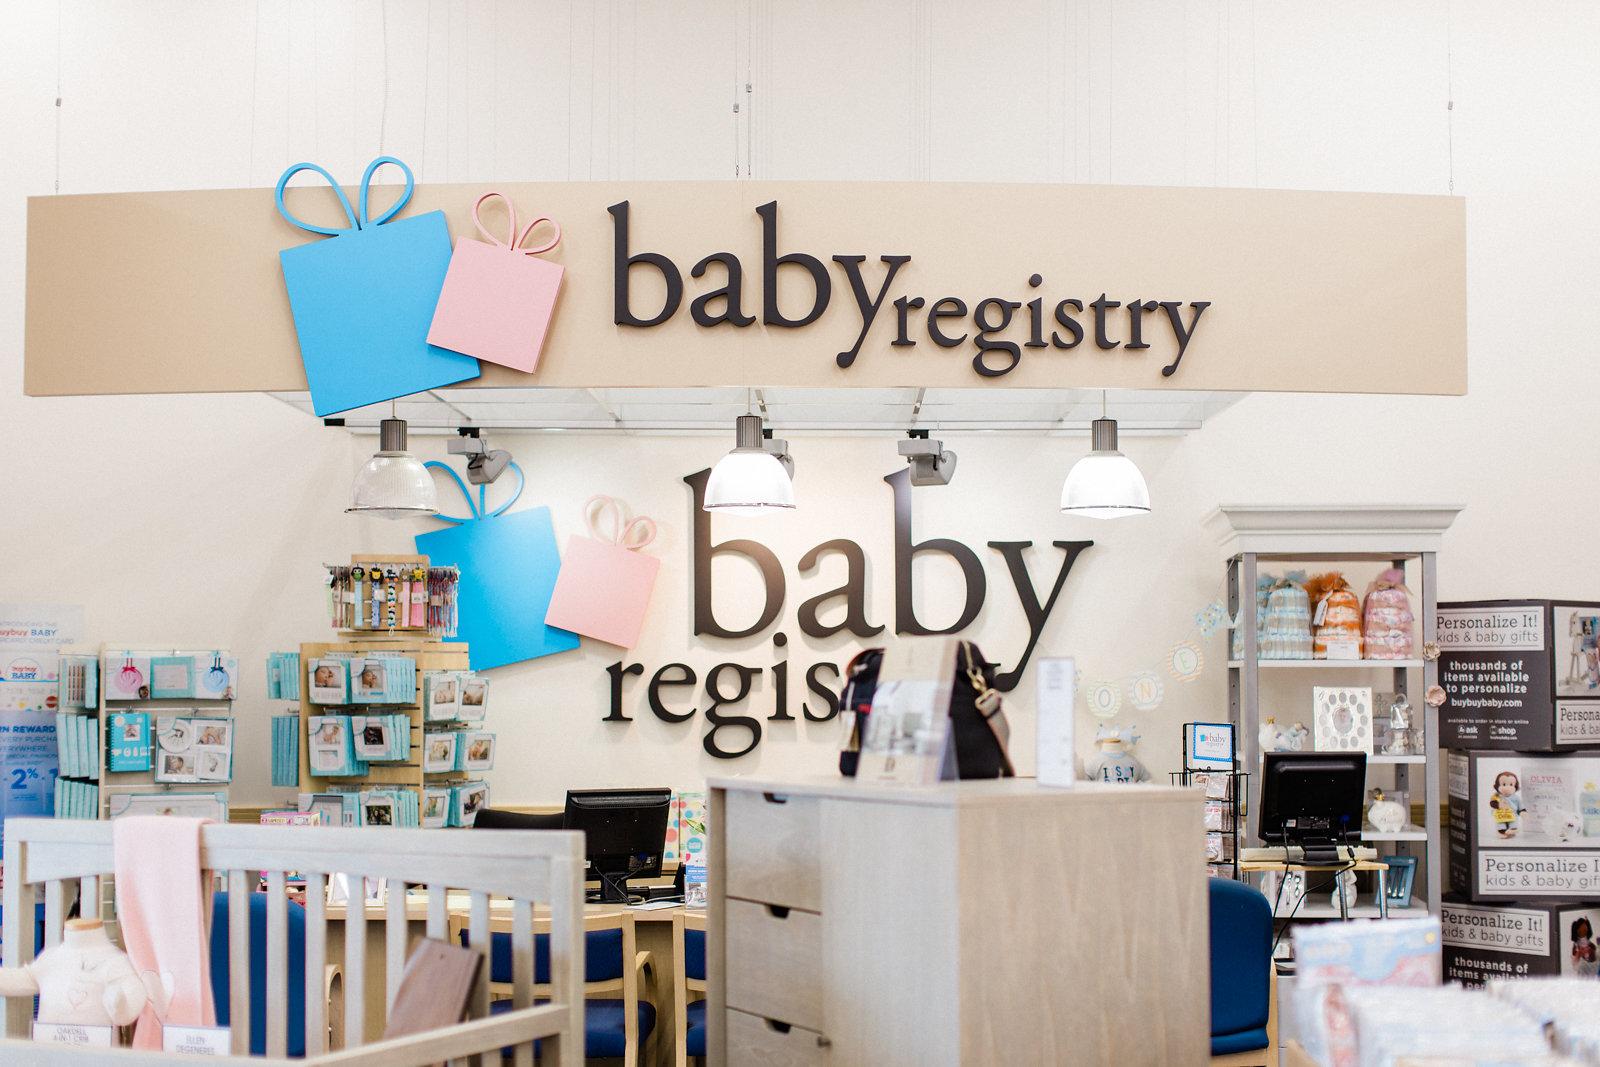 free baby box registry